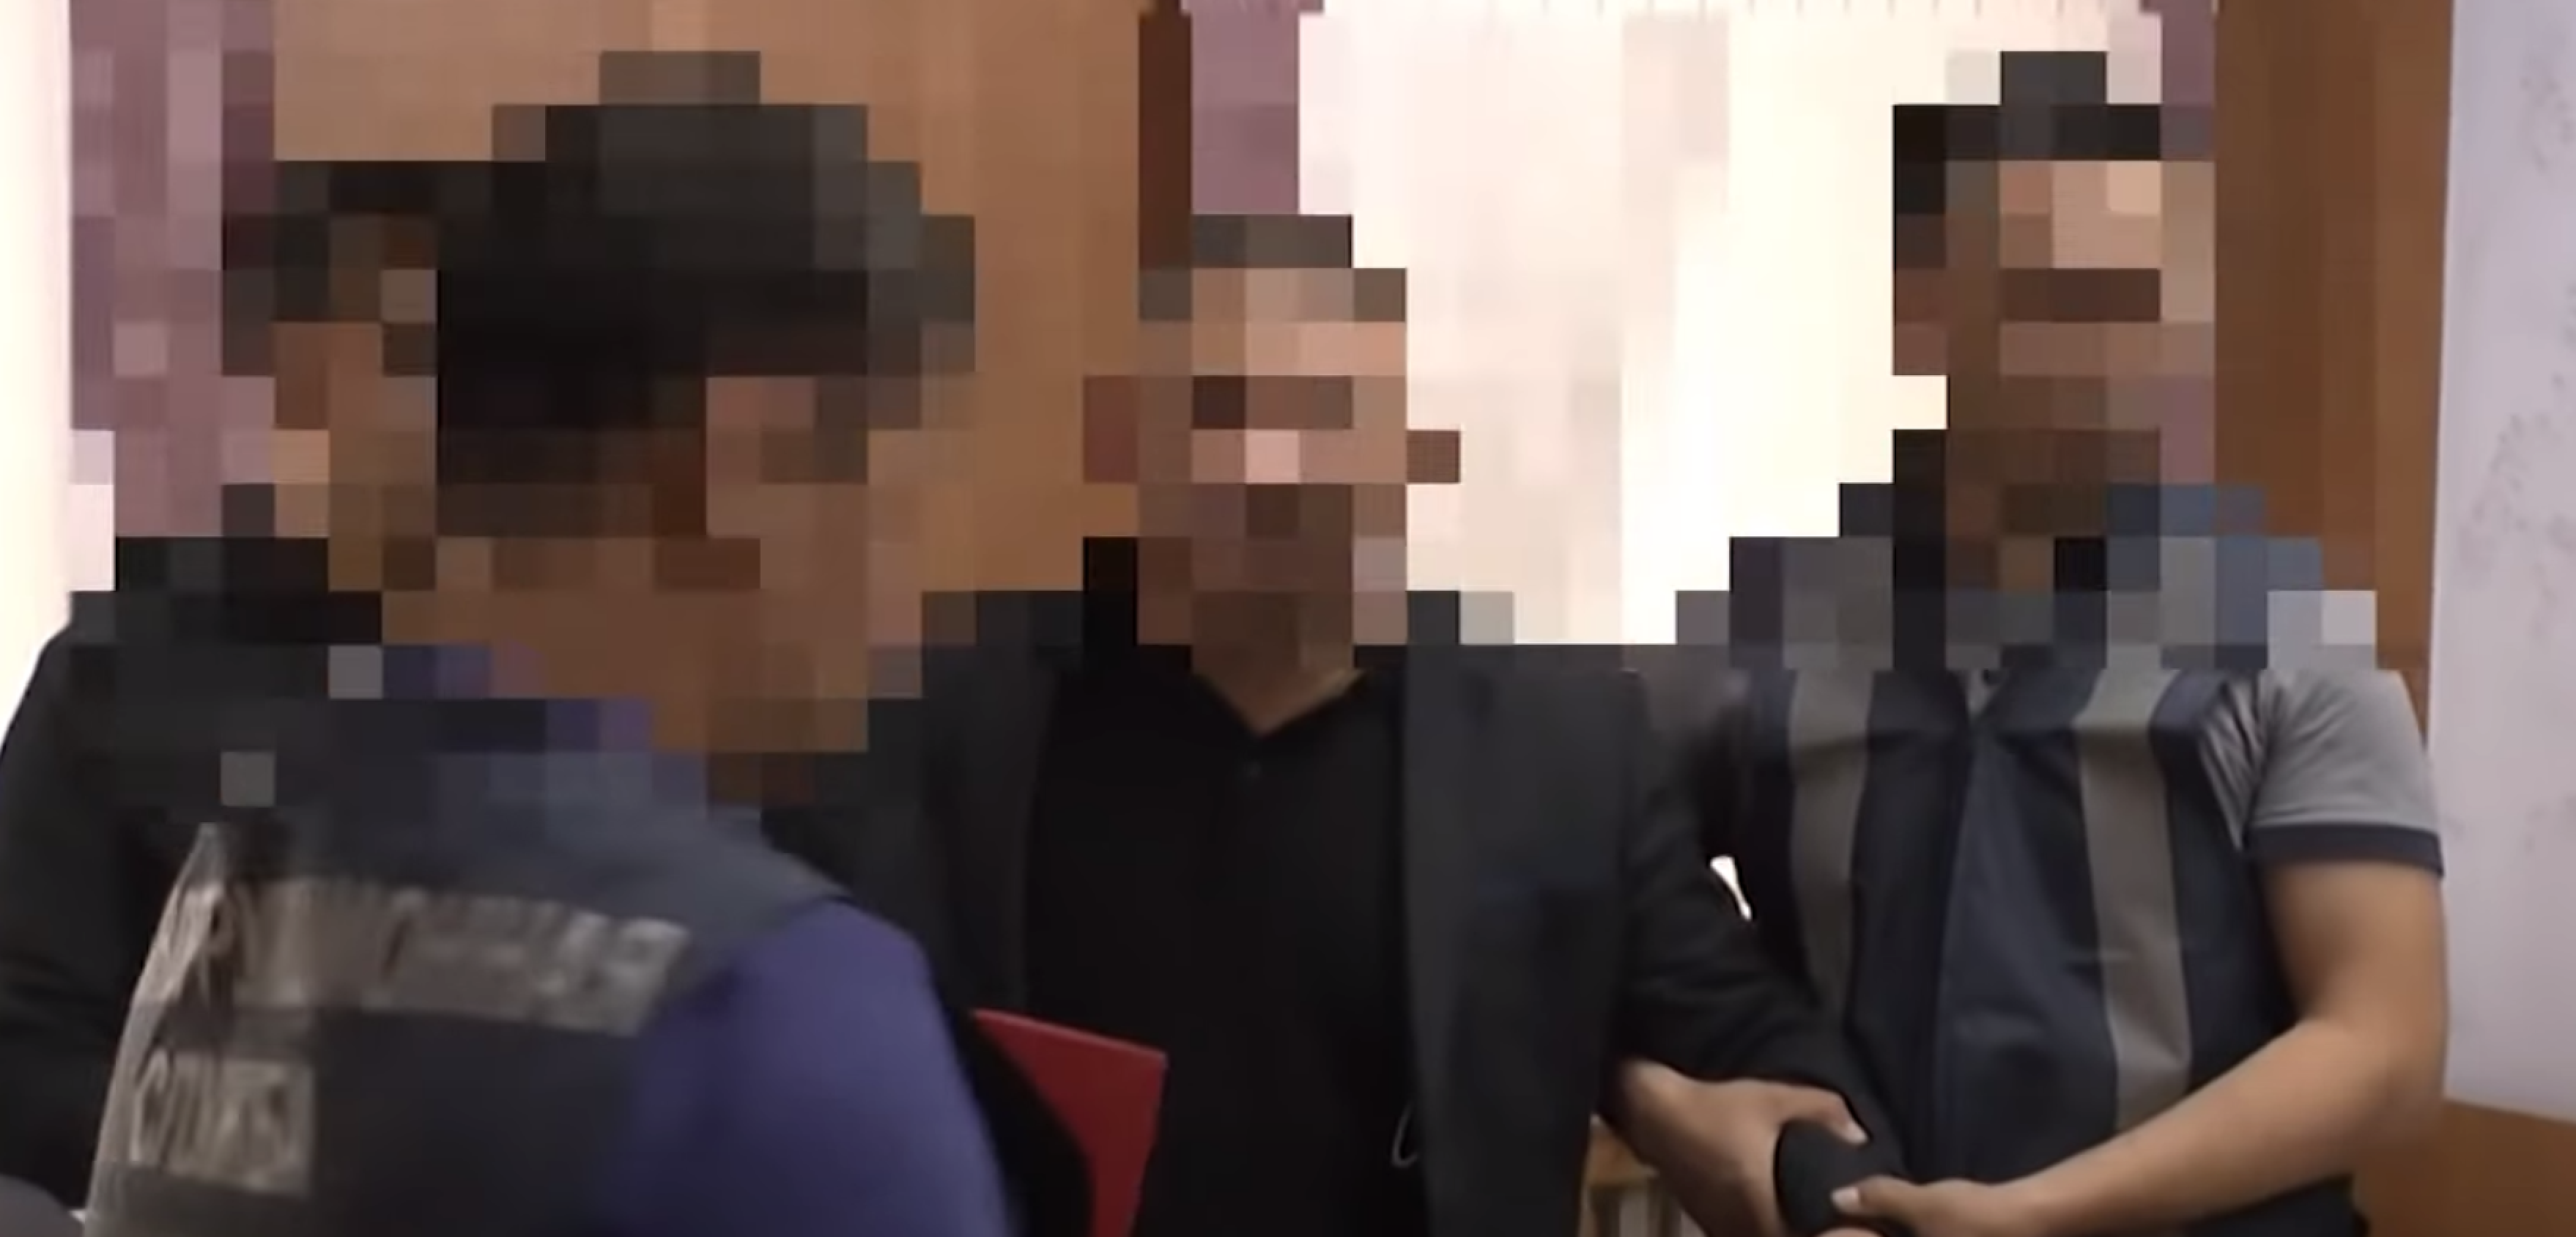 В Казахстане задержали акима крупного города: видео